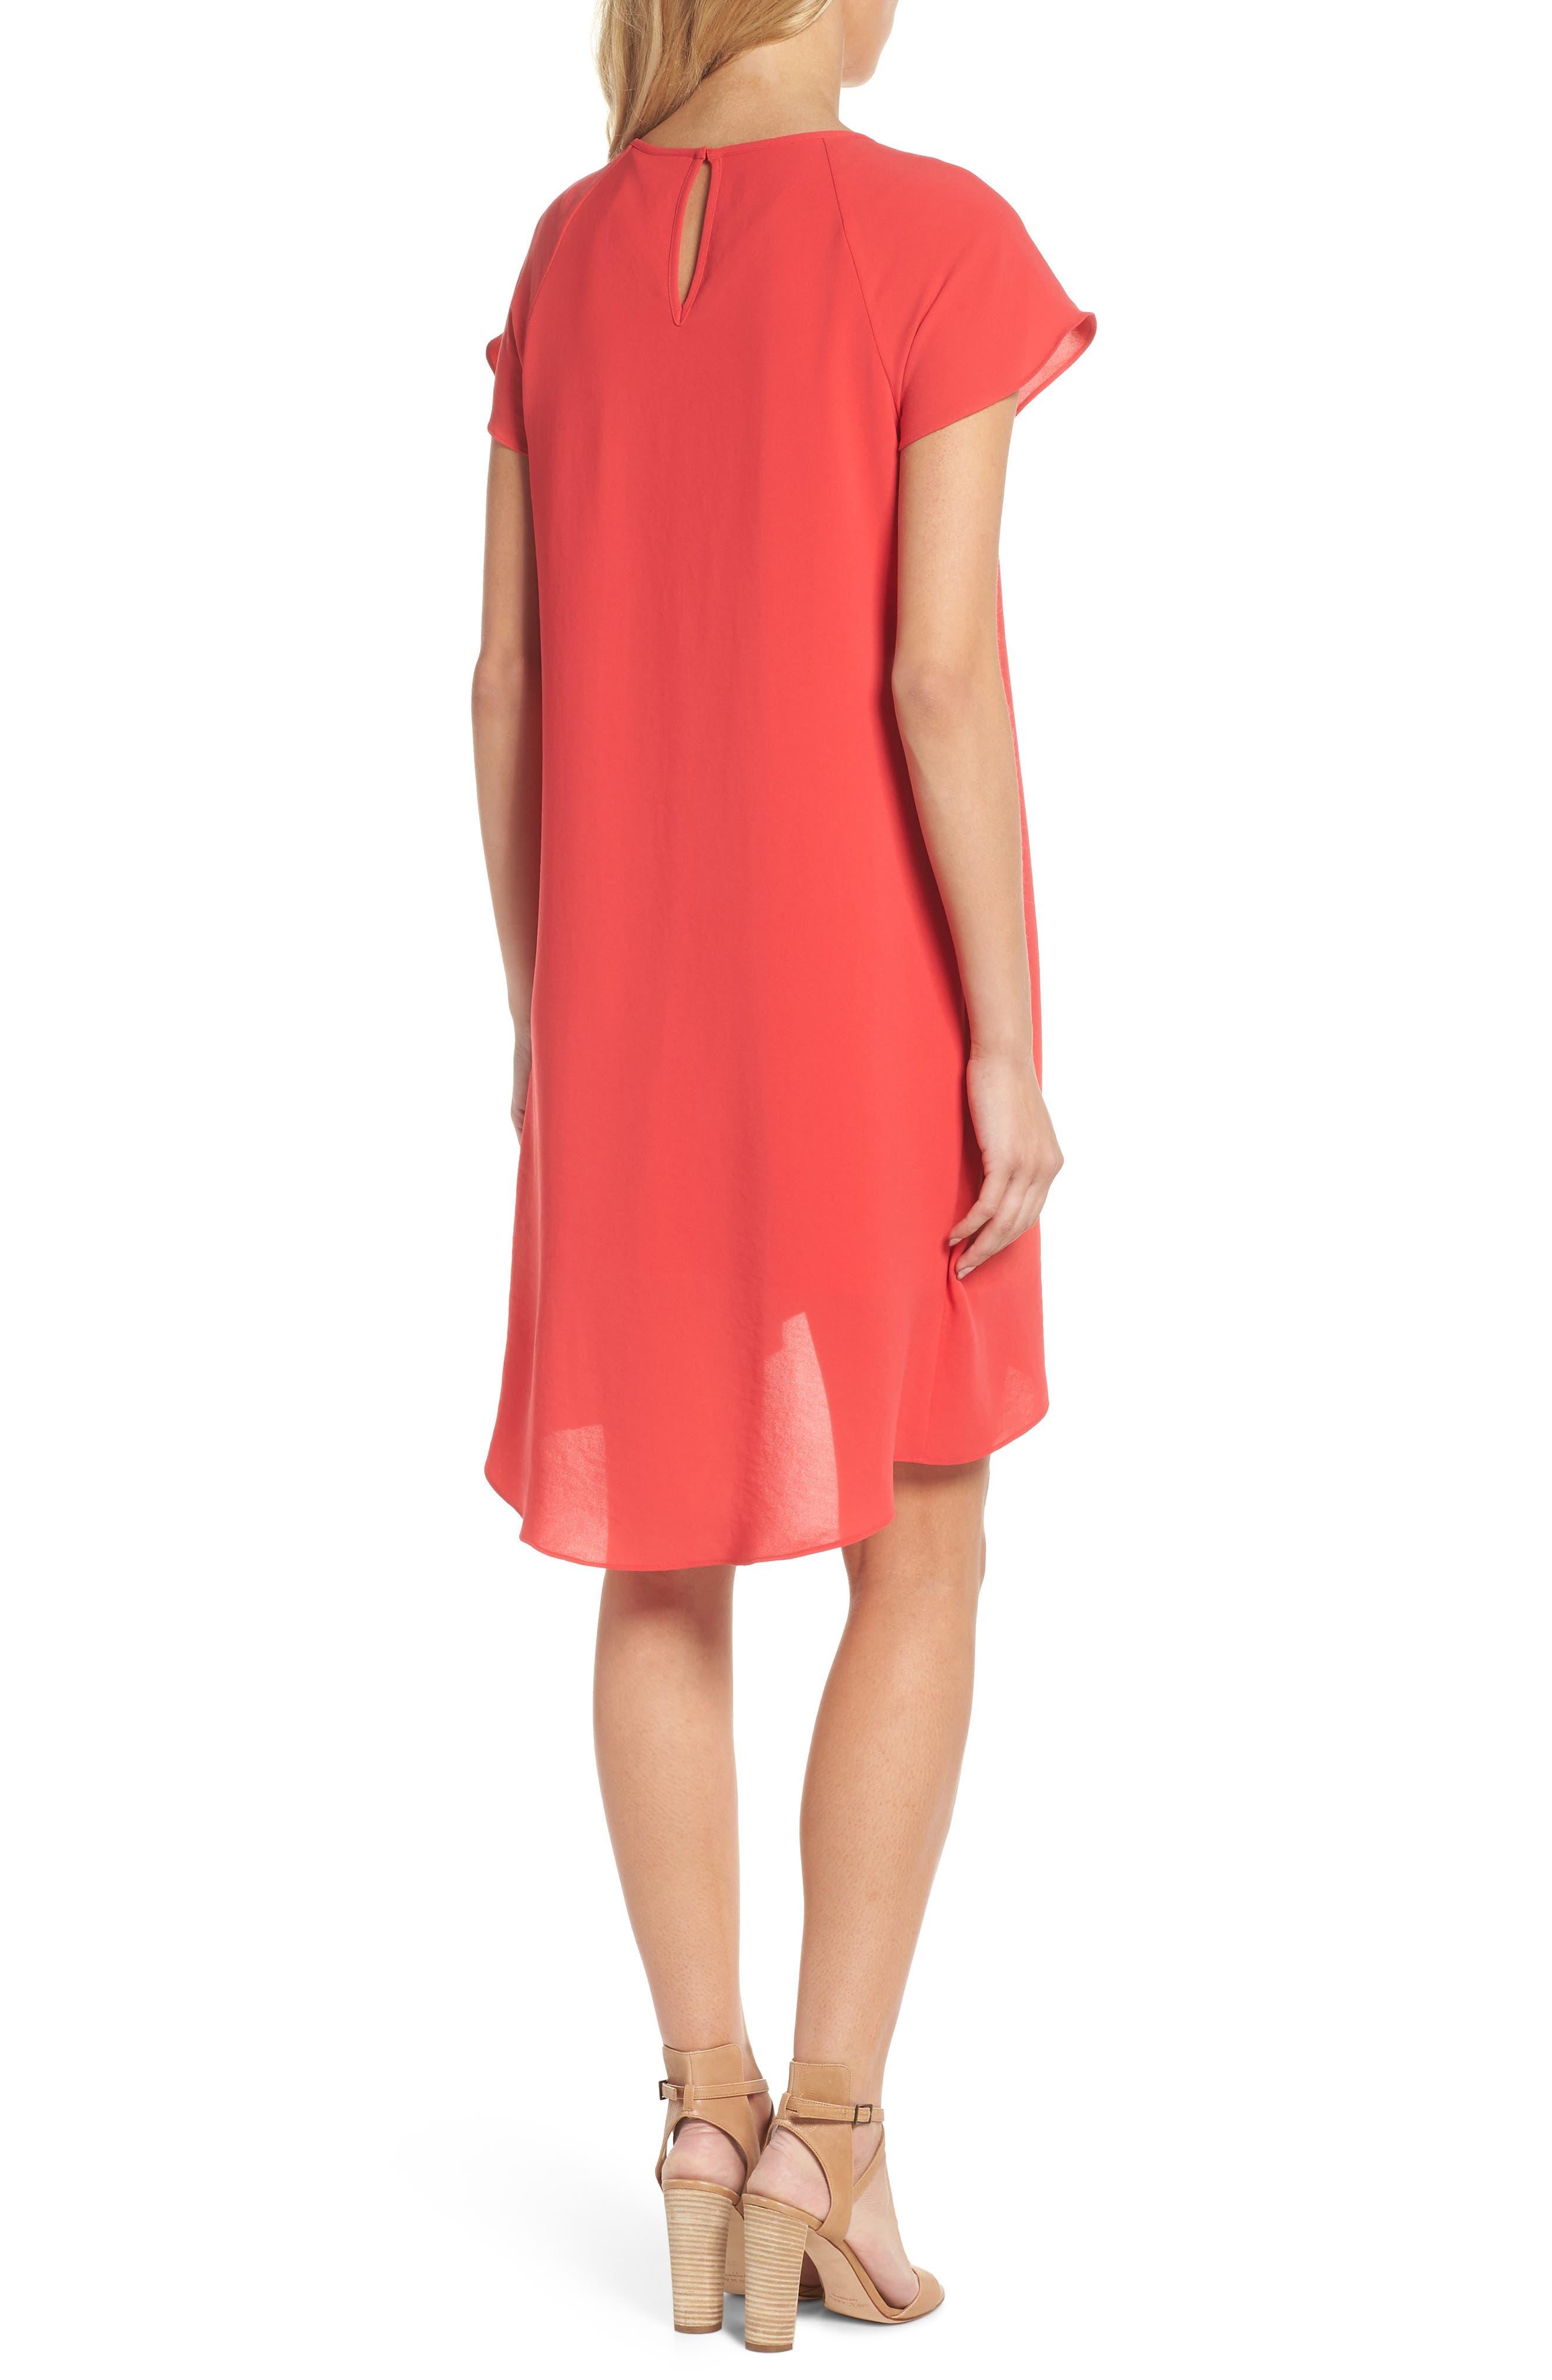 ADRIANNA PAPELL, Crepe Shift Dress, Alternate thumbnail 2, color, 650